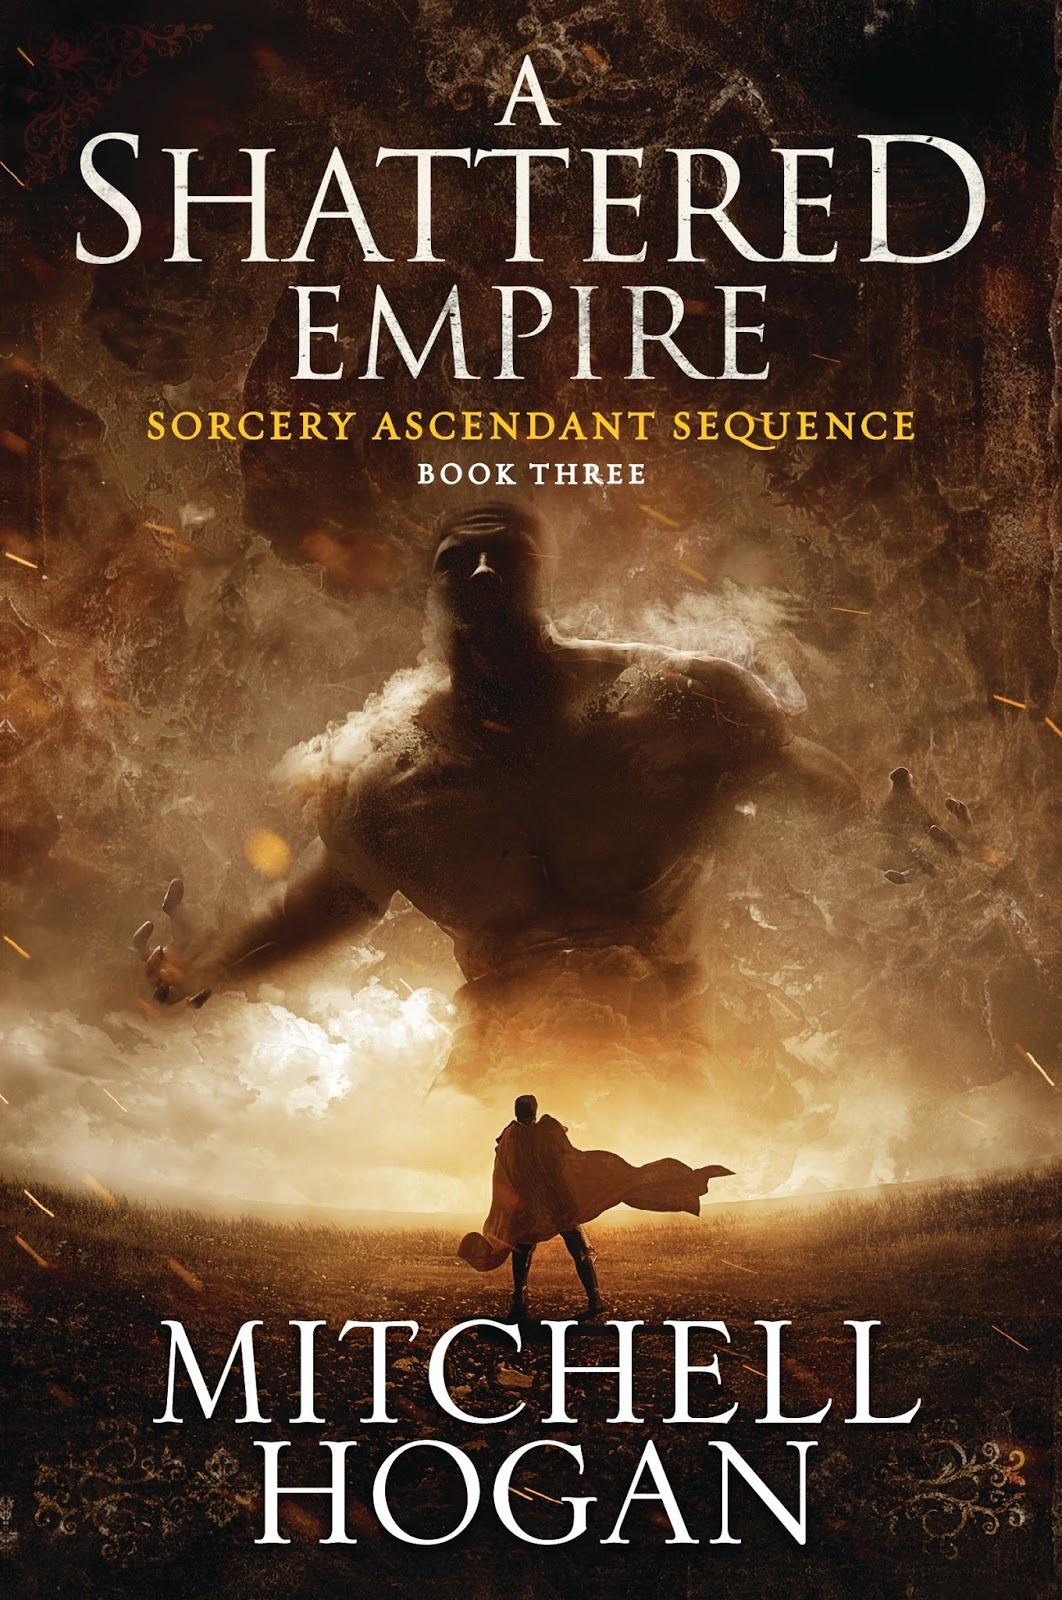 a shattered empire mitchell hogan epub download